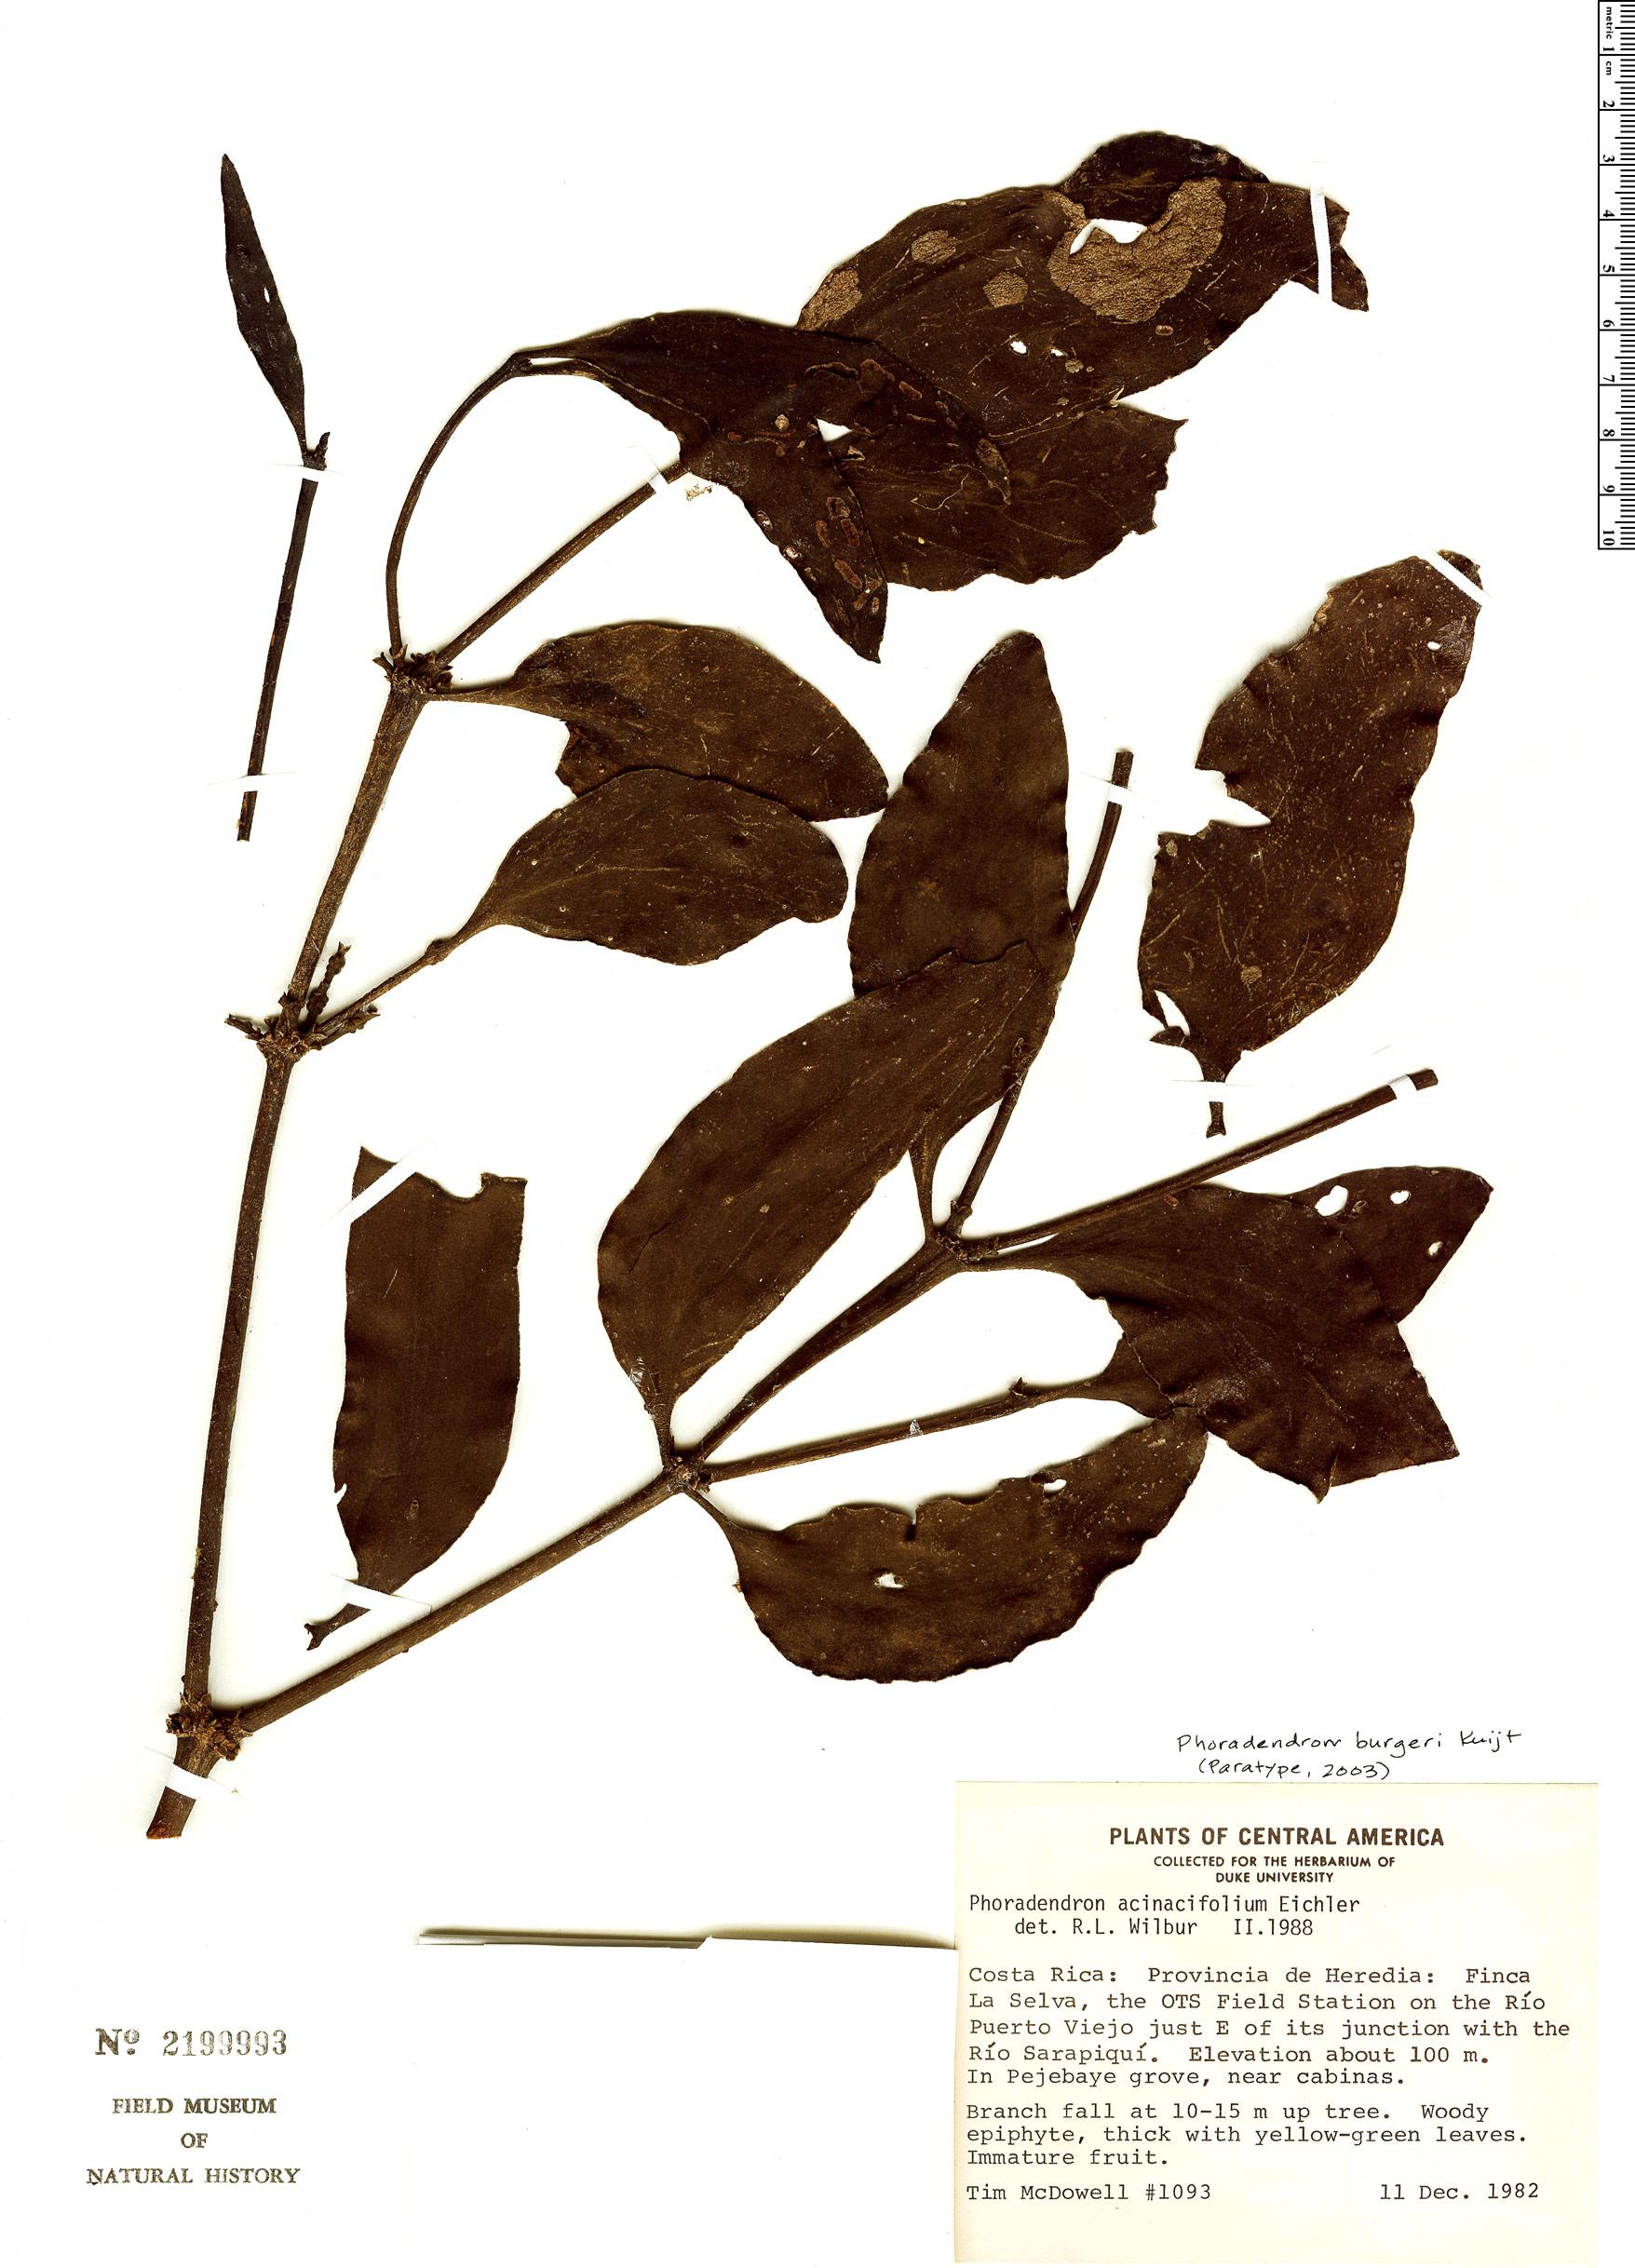 Specimen: Phoradendron burgeri